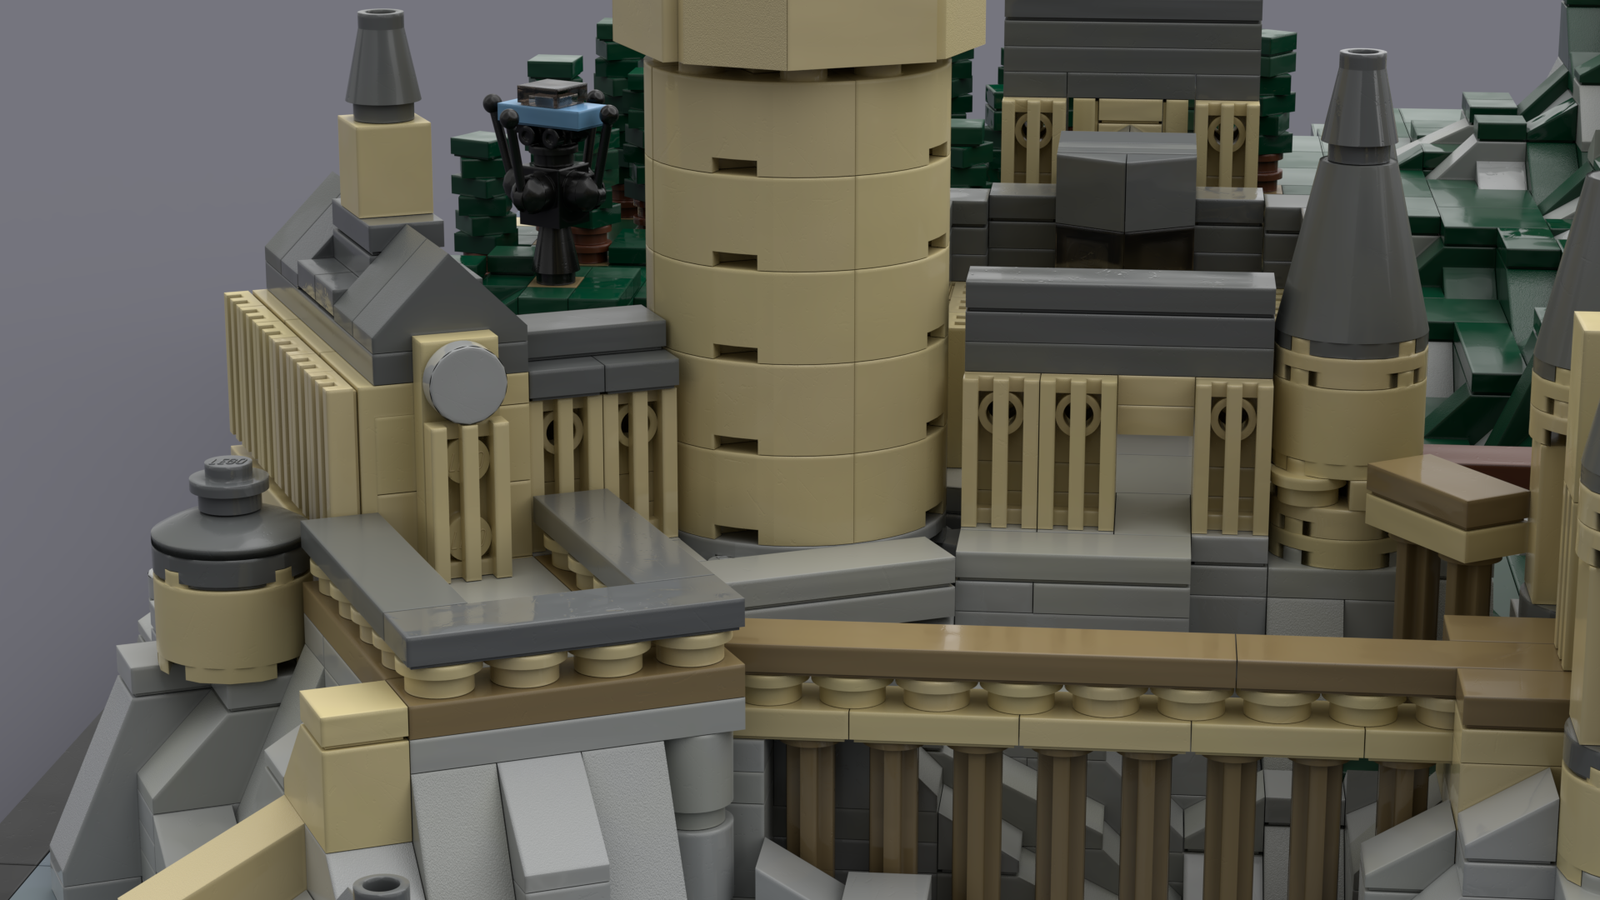 Lego Ideas Product Ideas Hogwarts Castle Miniature Model